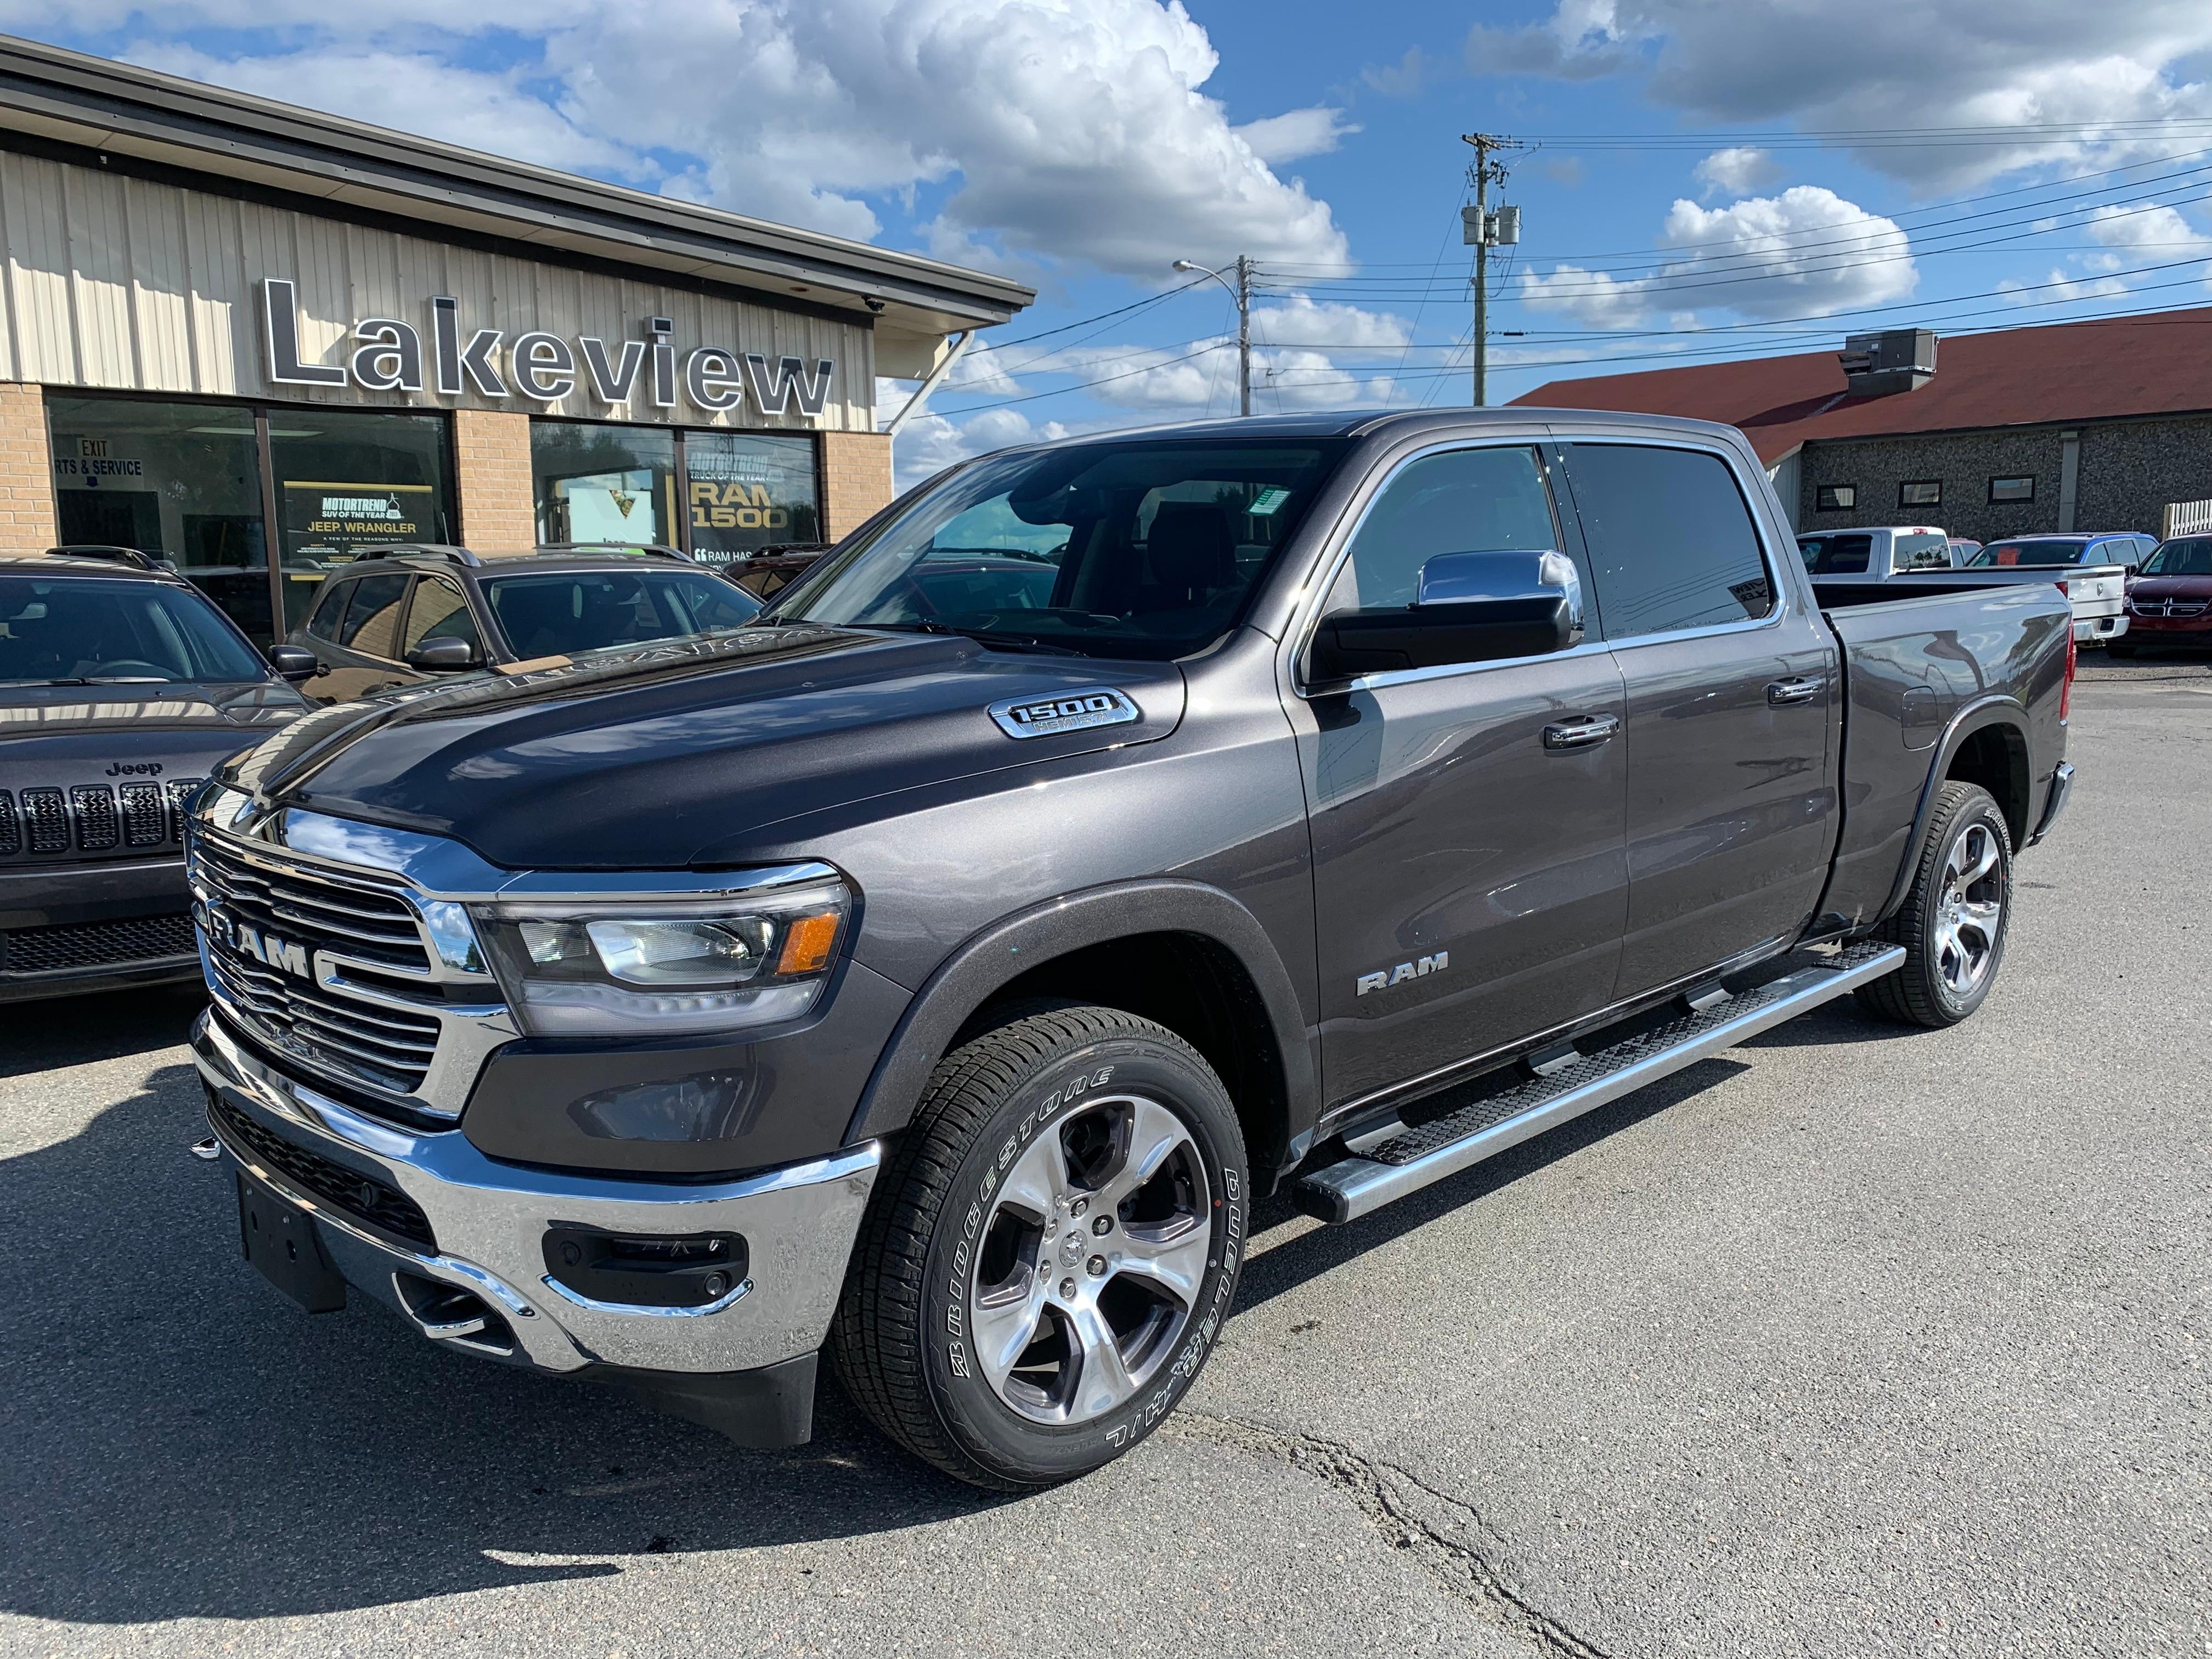 2019 Ram **DEMO** All-New 1500 Laramie Crew Cab